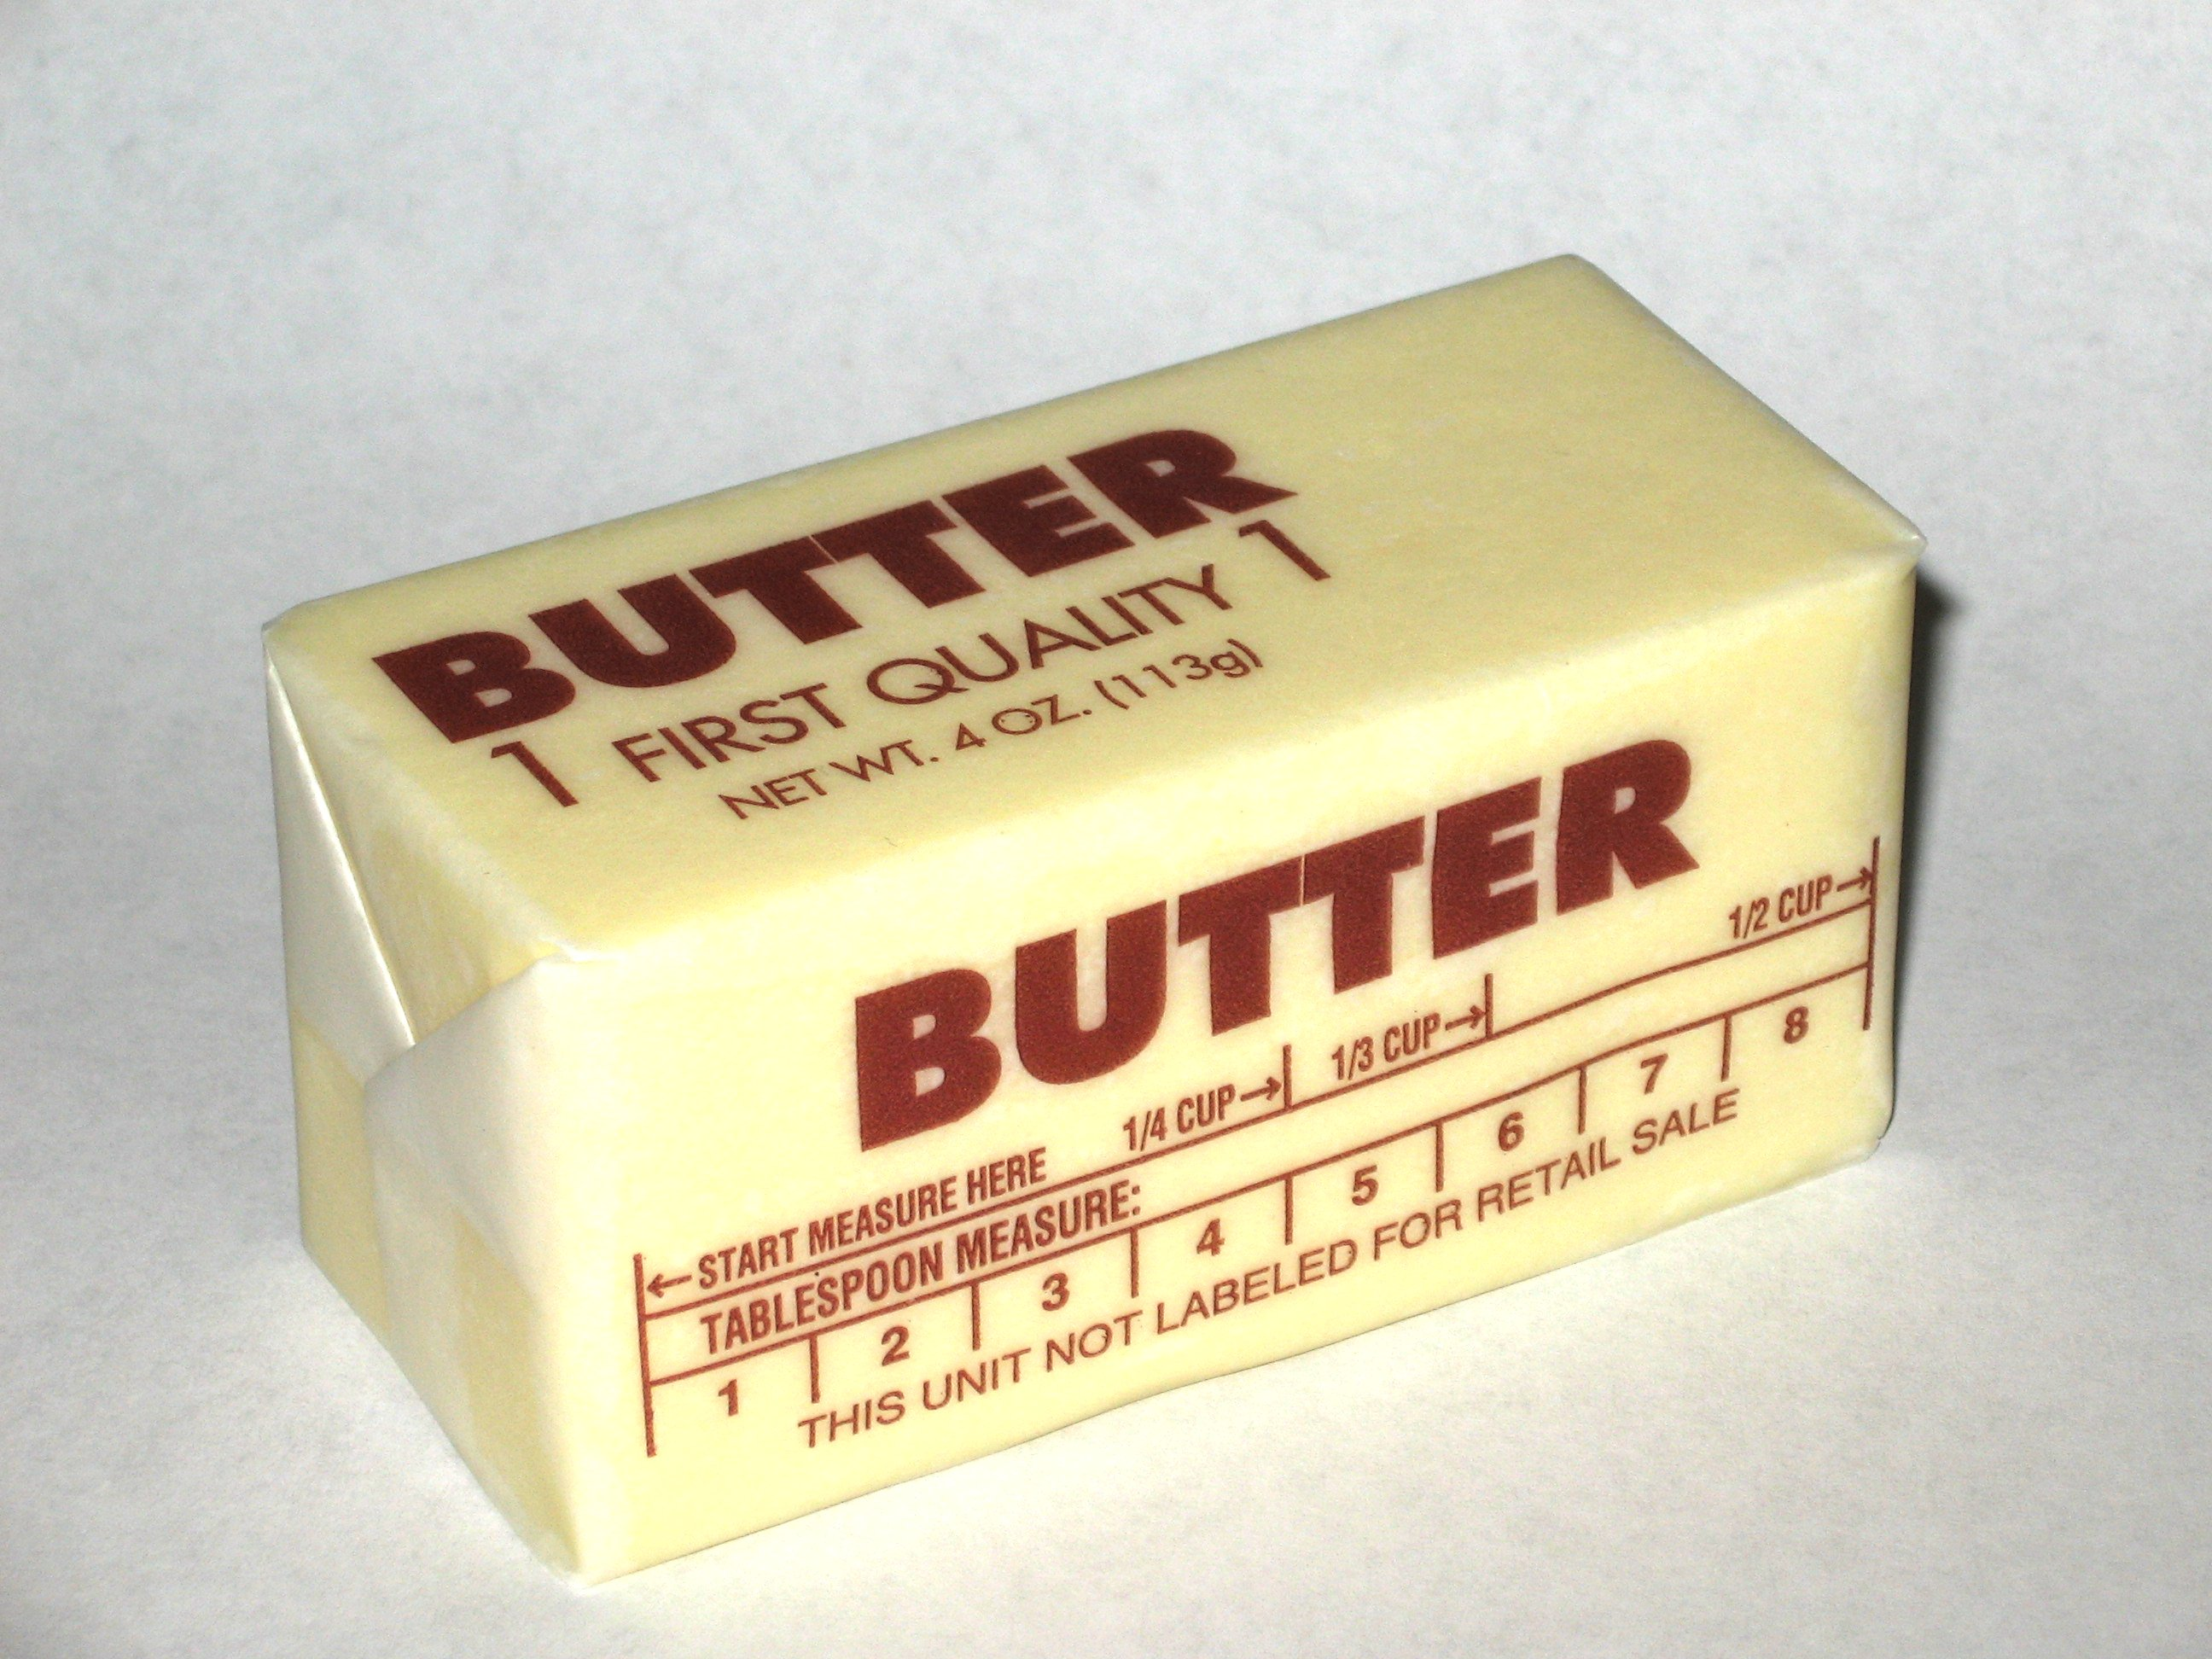 Butter pack